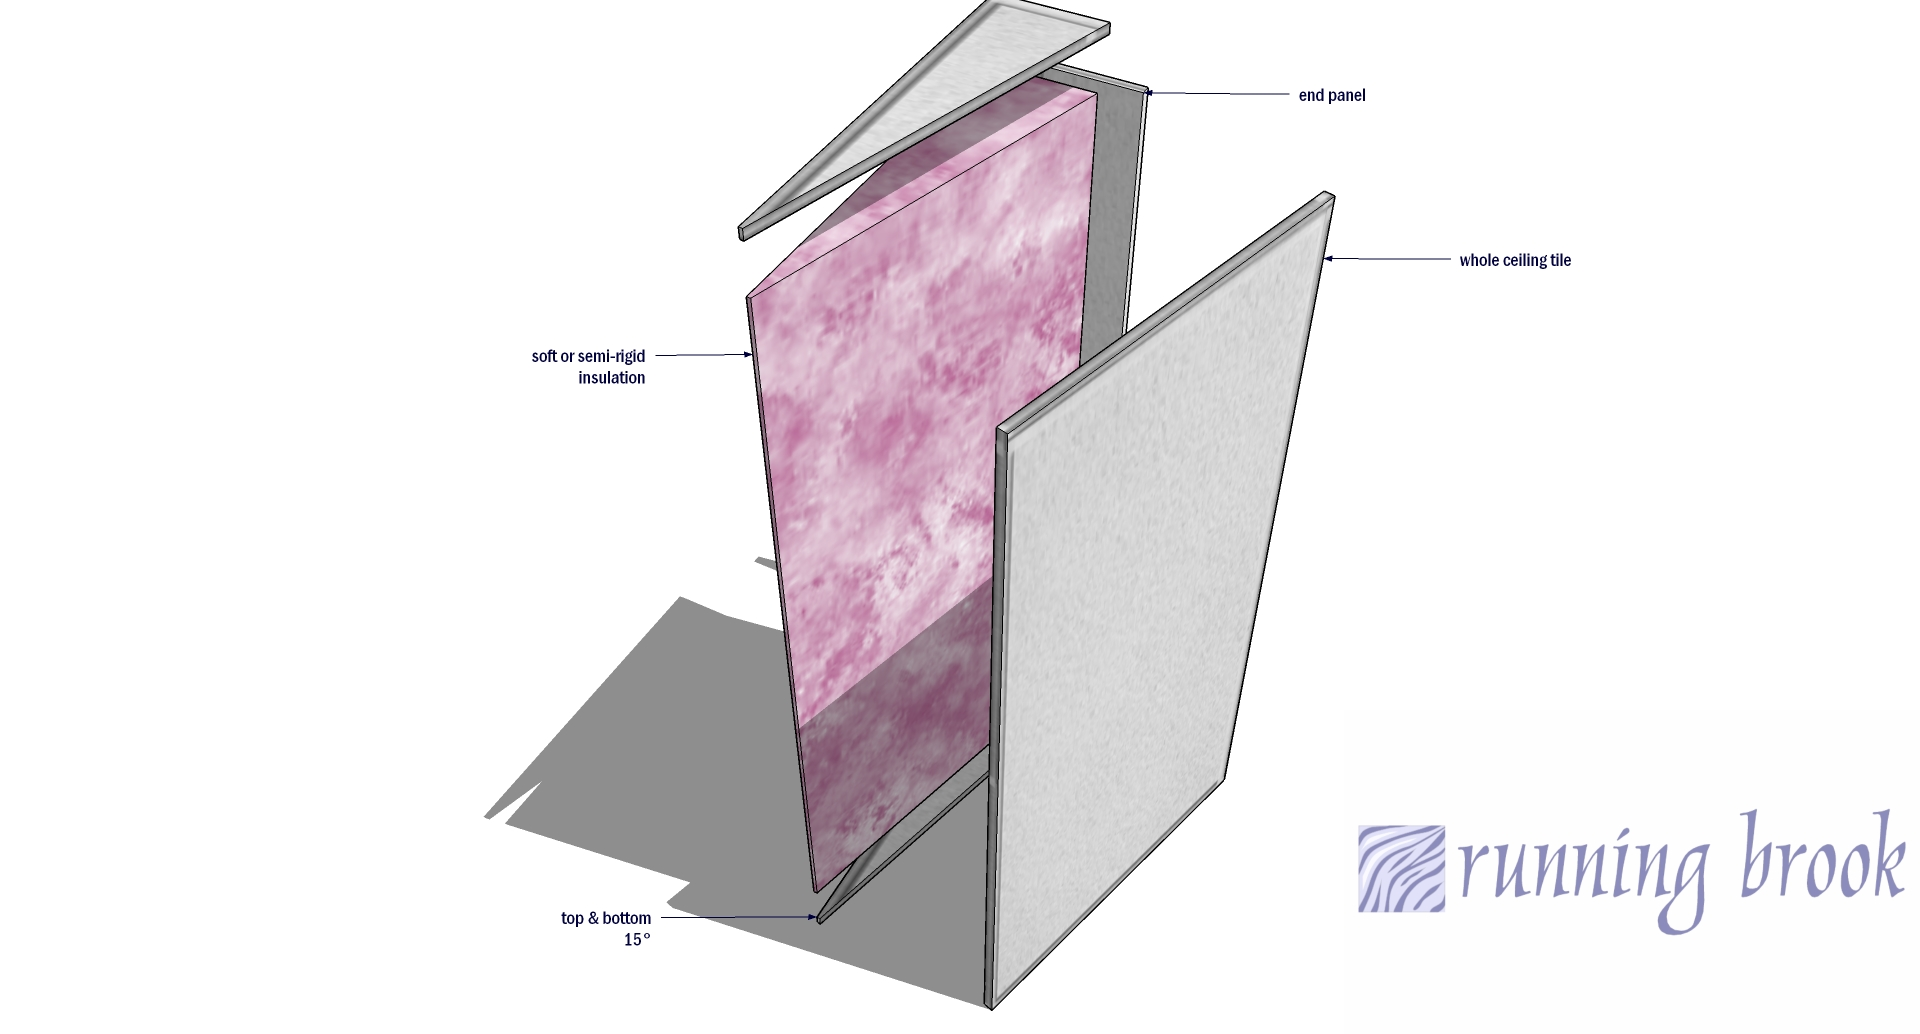 Creative uses for drop ceiling tile? - Gearslutz